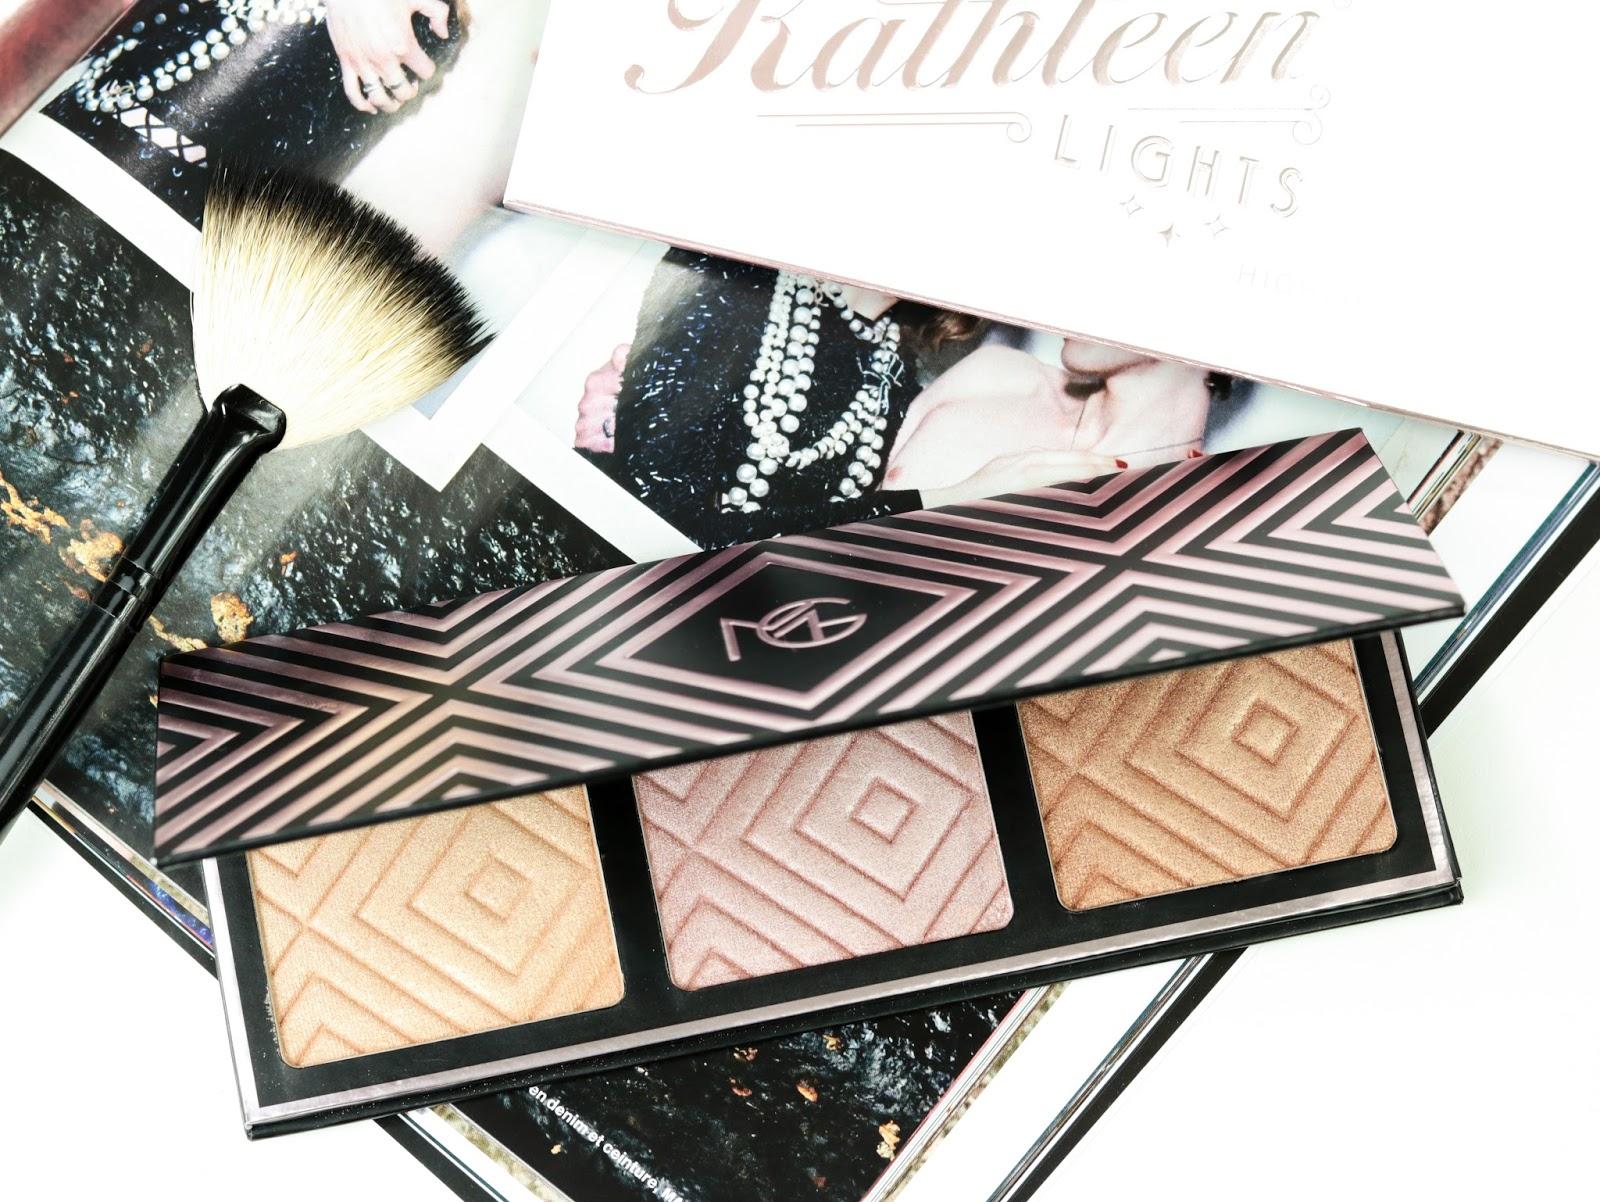 La palette d'highligters Makeup Geek X Kathleen Lights avis et swatch